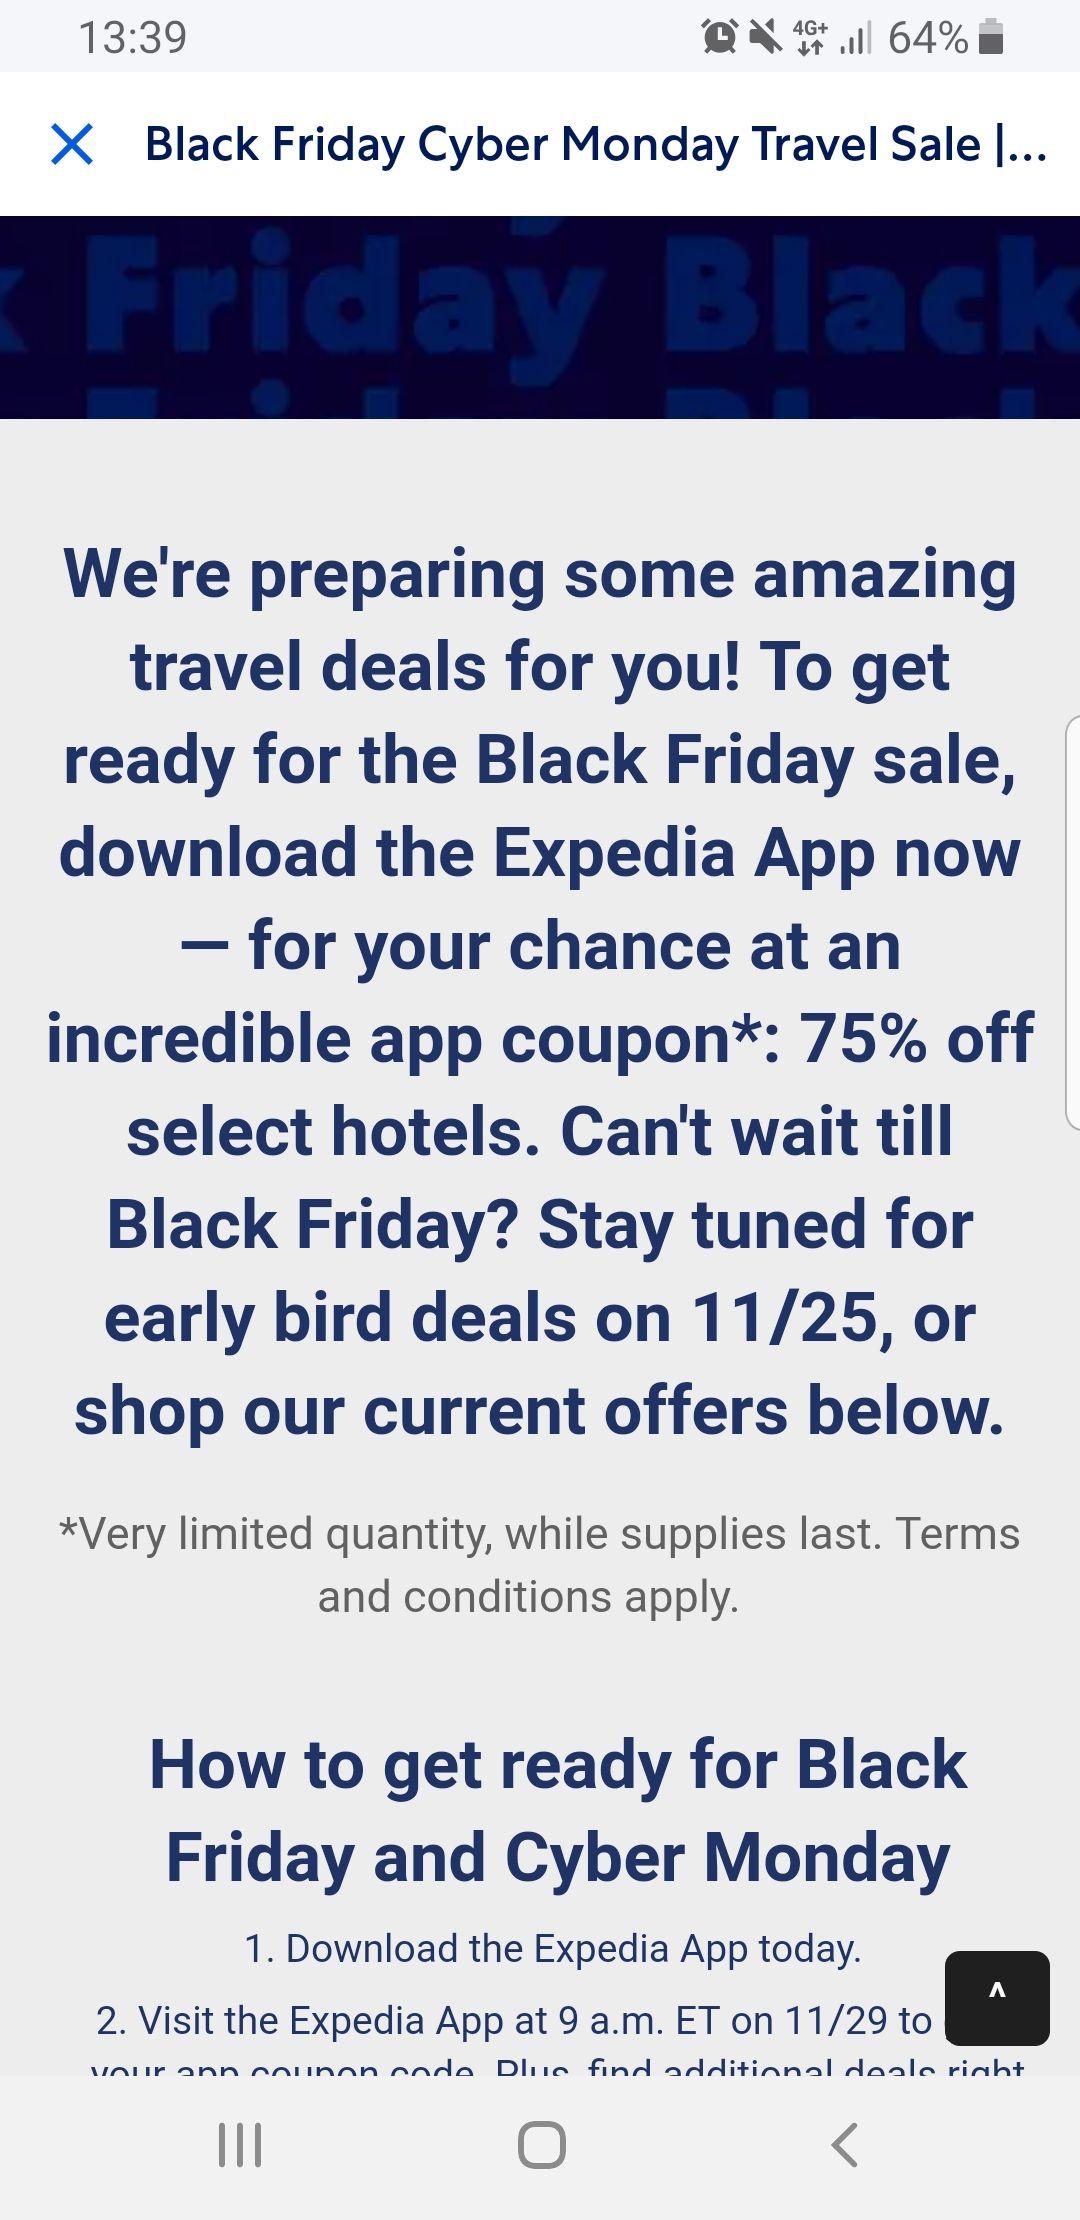 Expedia blackfriday 75% korting op hotels!